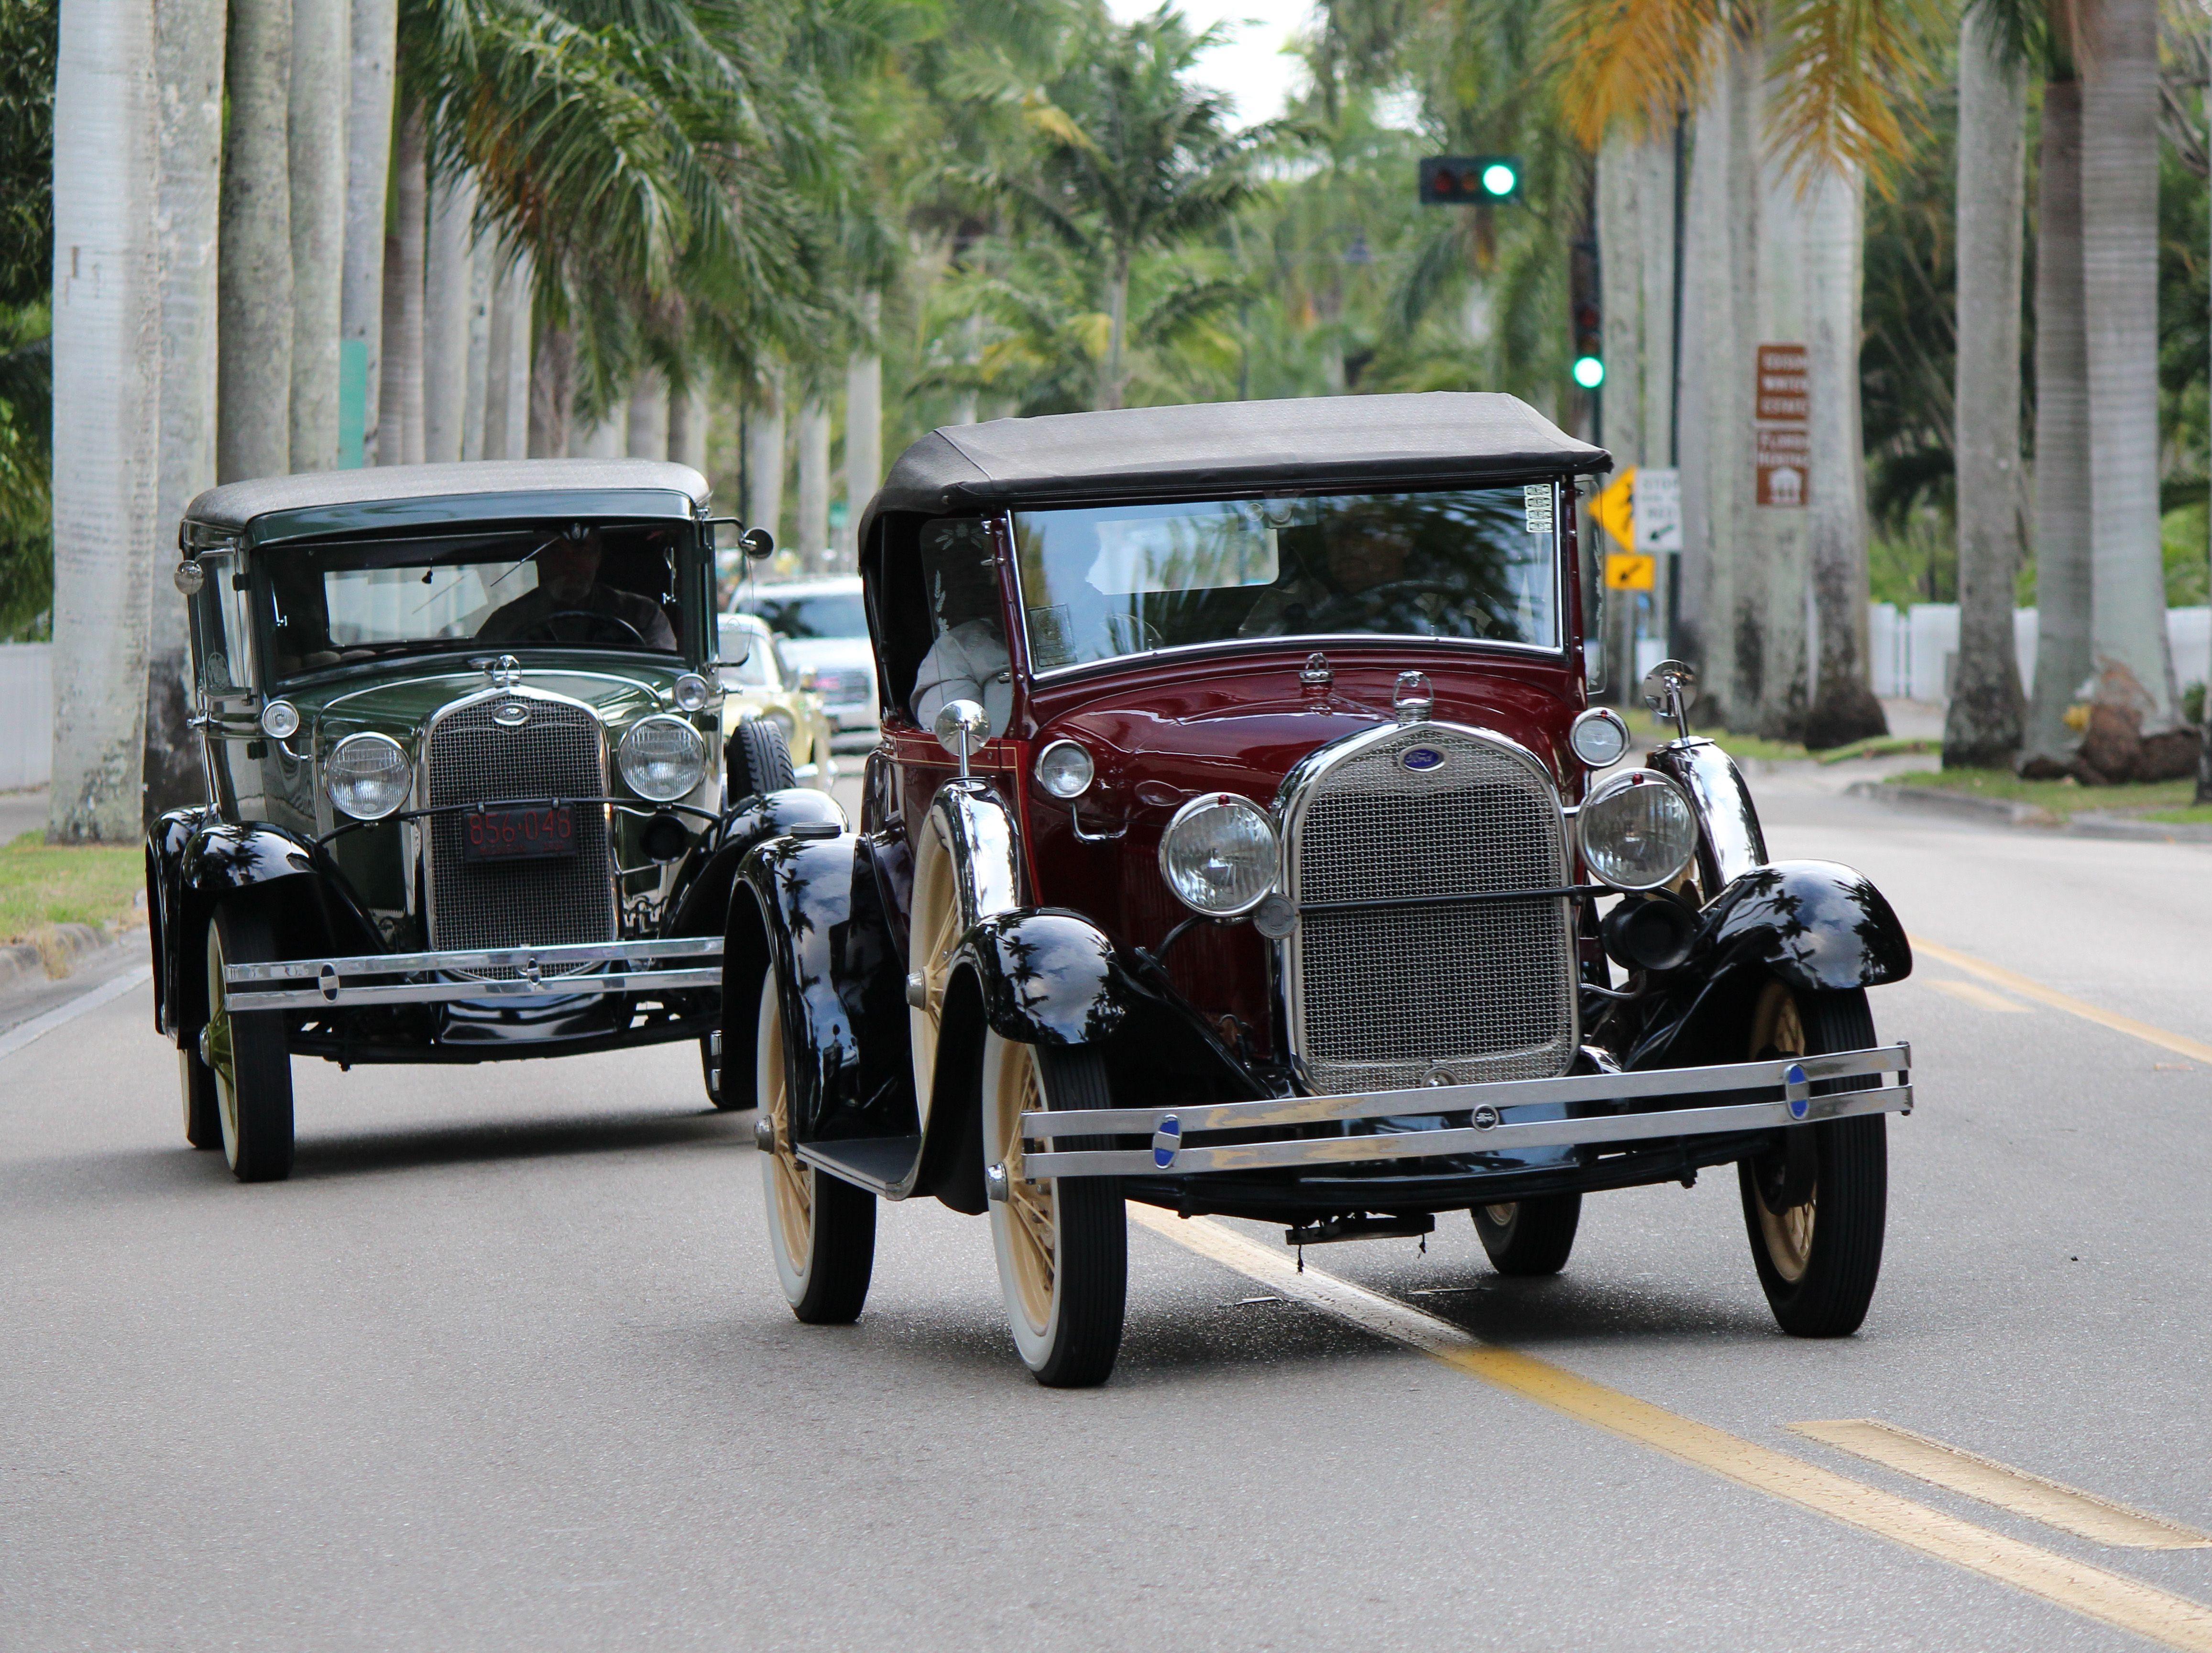 Thomas Mina Edison Henry Clara Ford Vintage Cars Classic